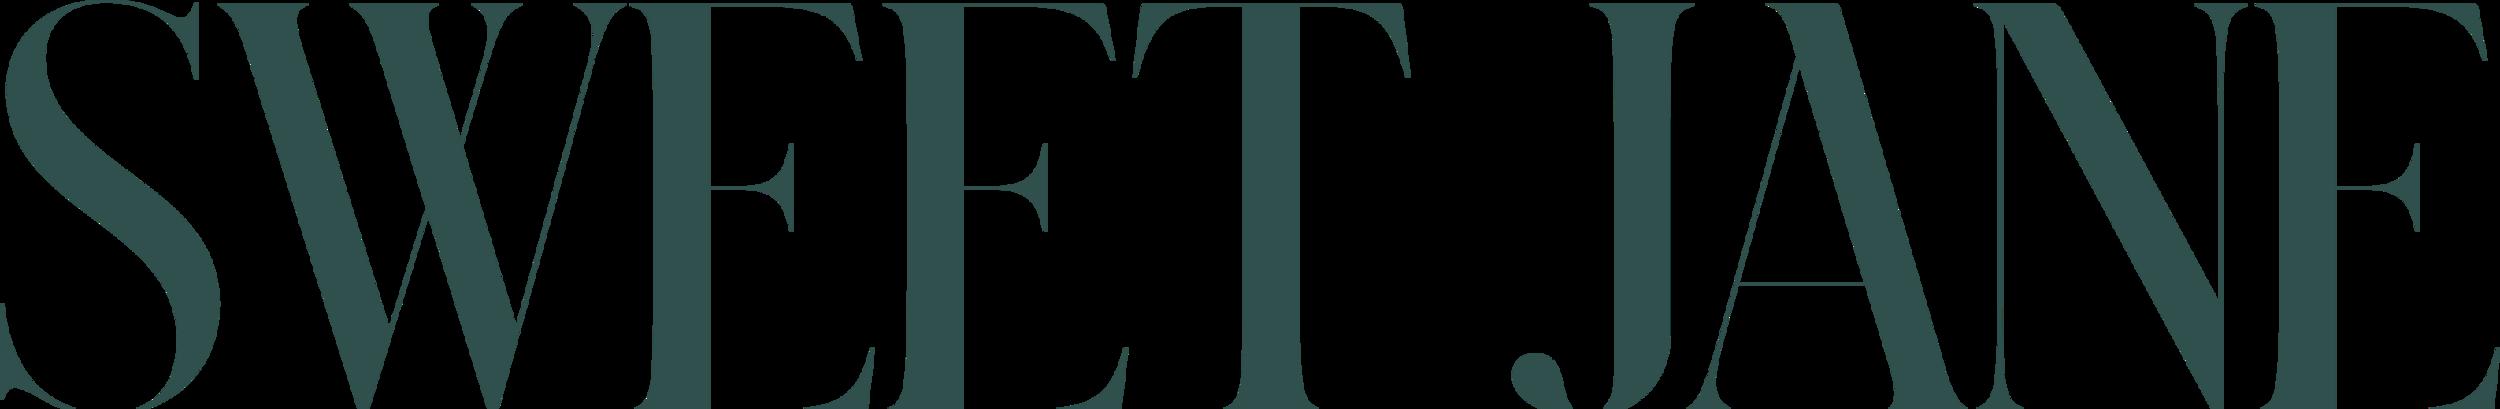 SweetJane_Logo.png